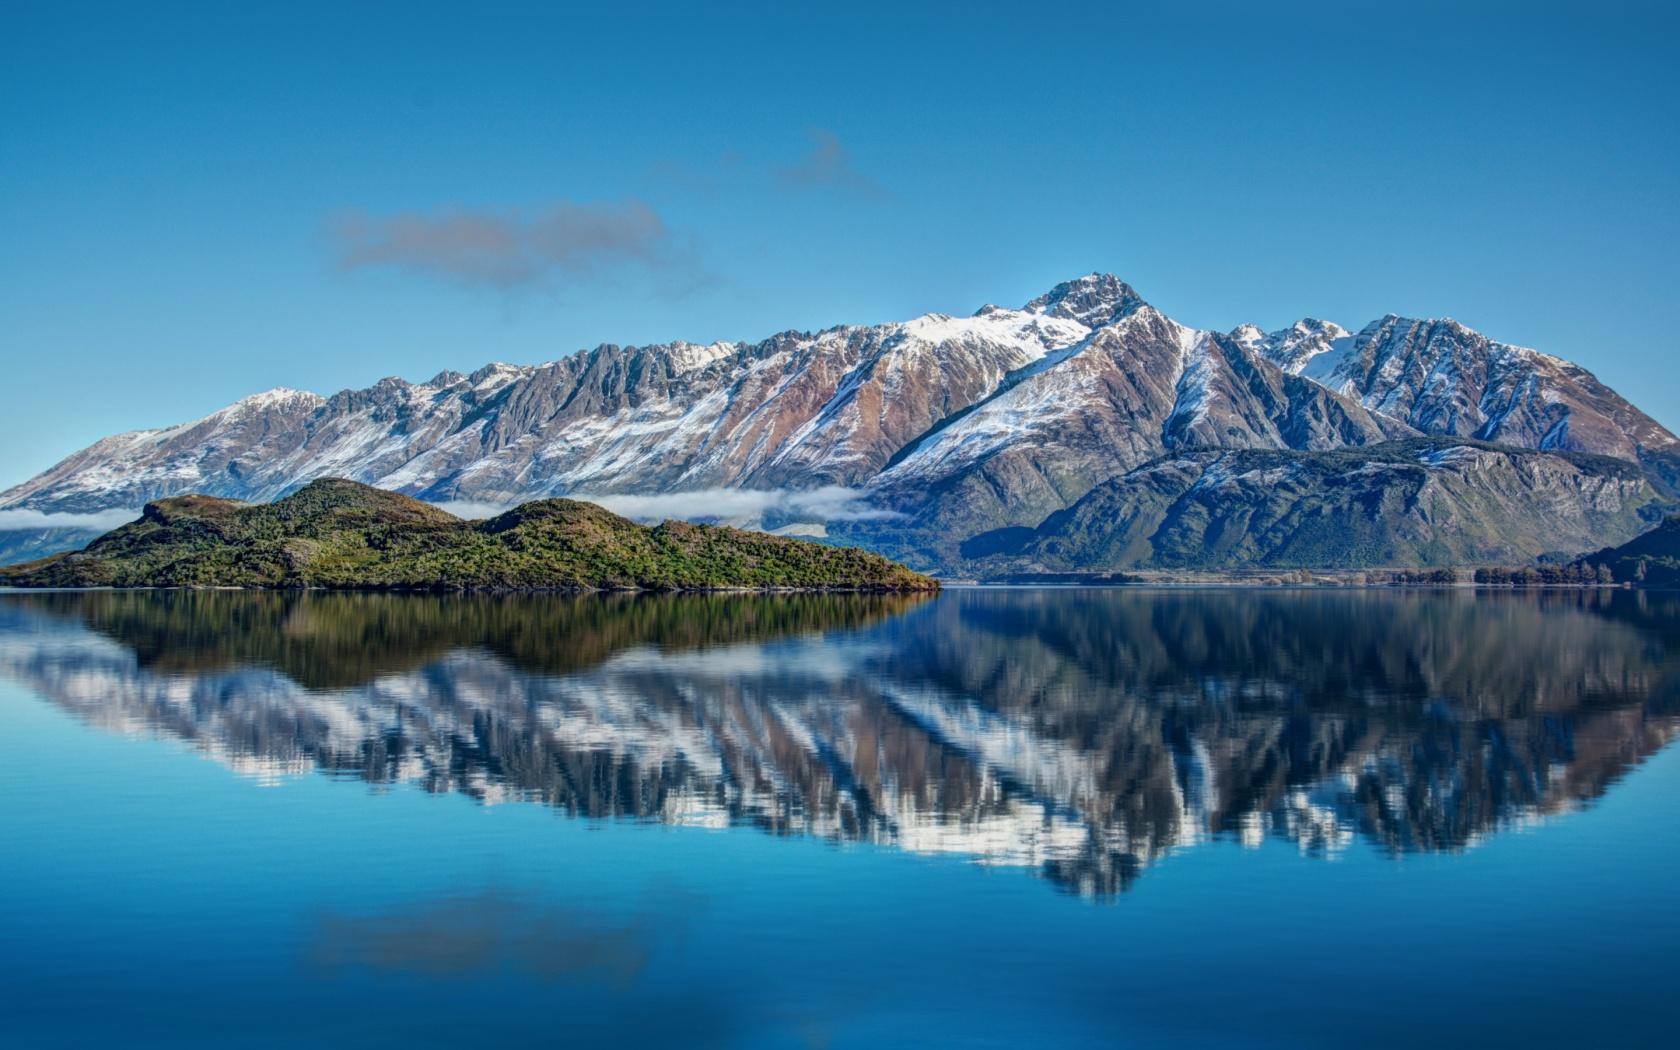 lake wallpaper widescreen